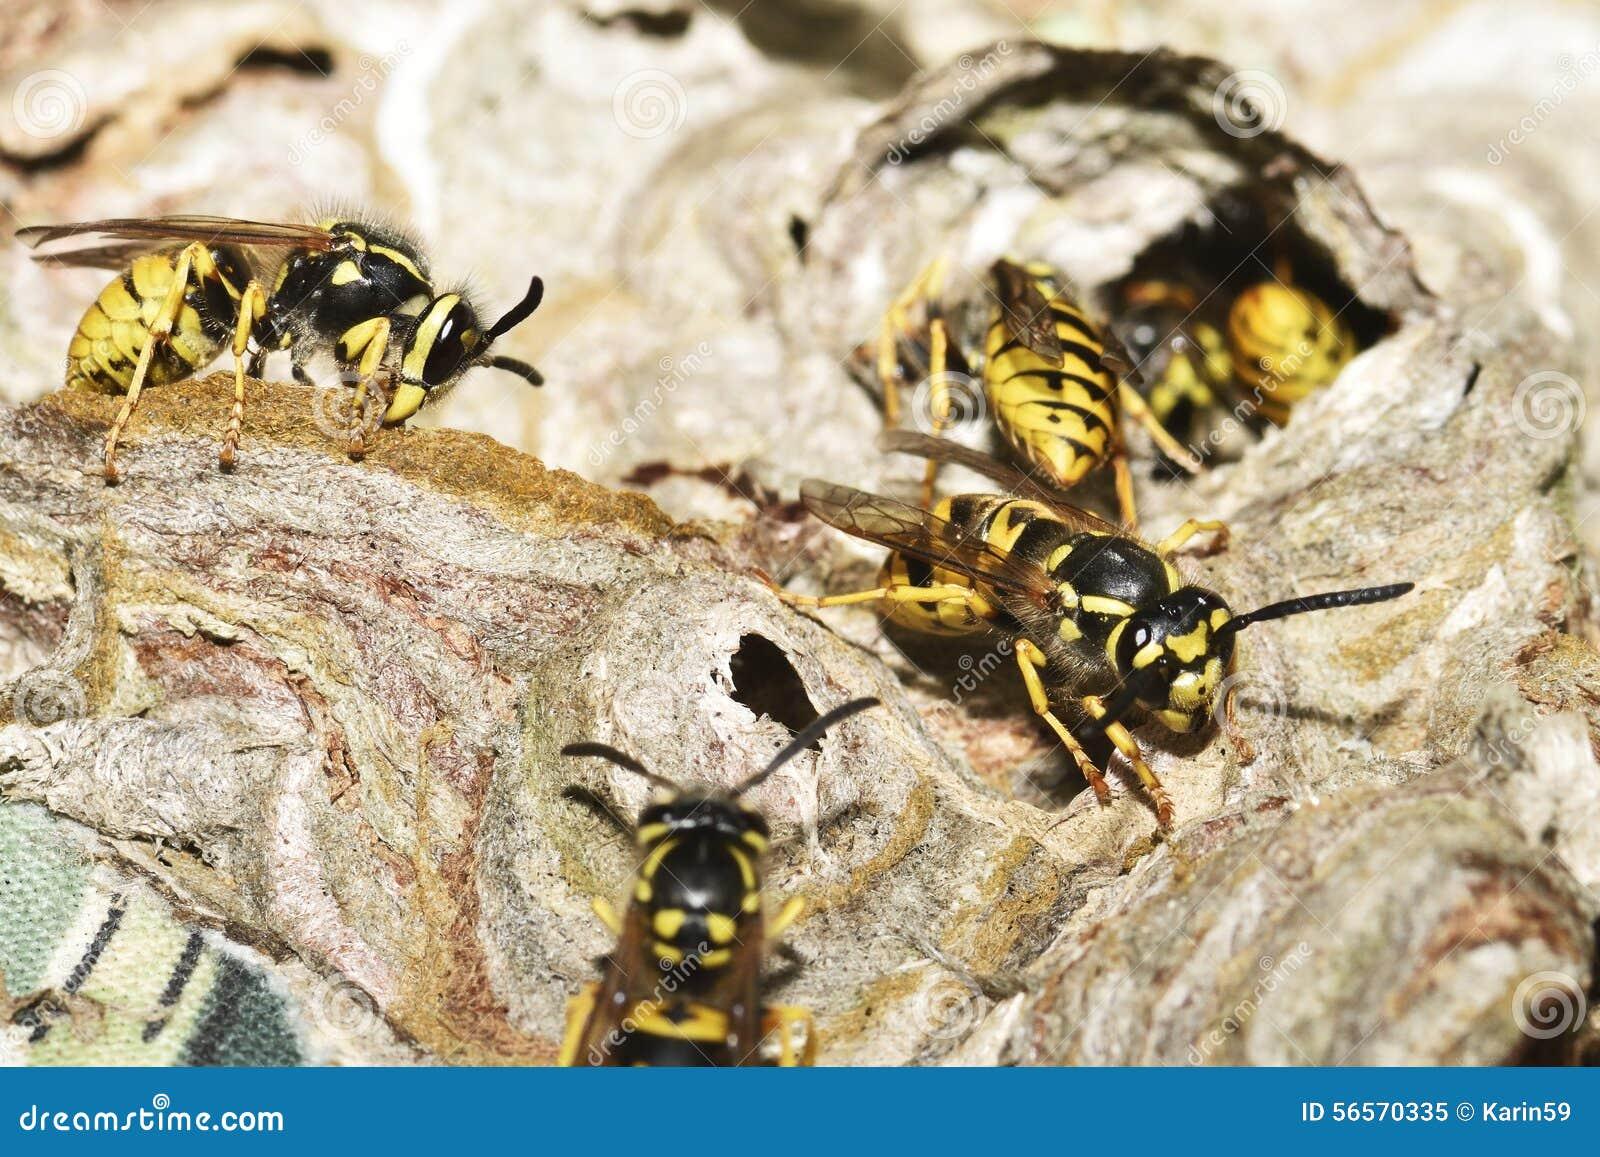 Download Ευρωπαϊκή σφήκα στοκ εικόνα. εικόνα από εργαζόμενος, bipeds - 56570335